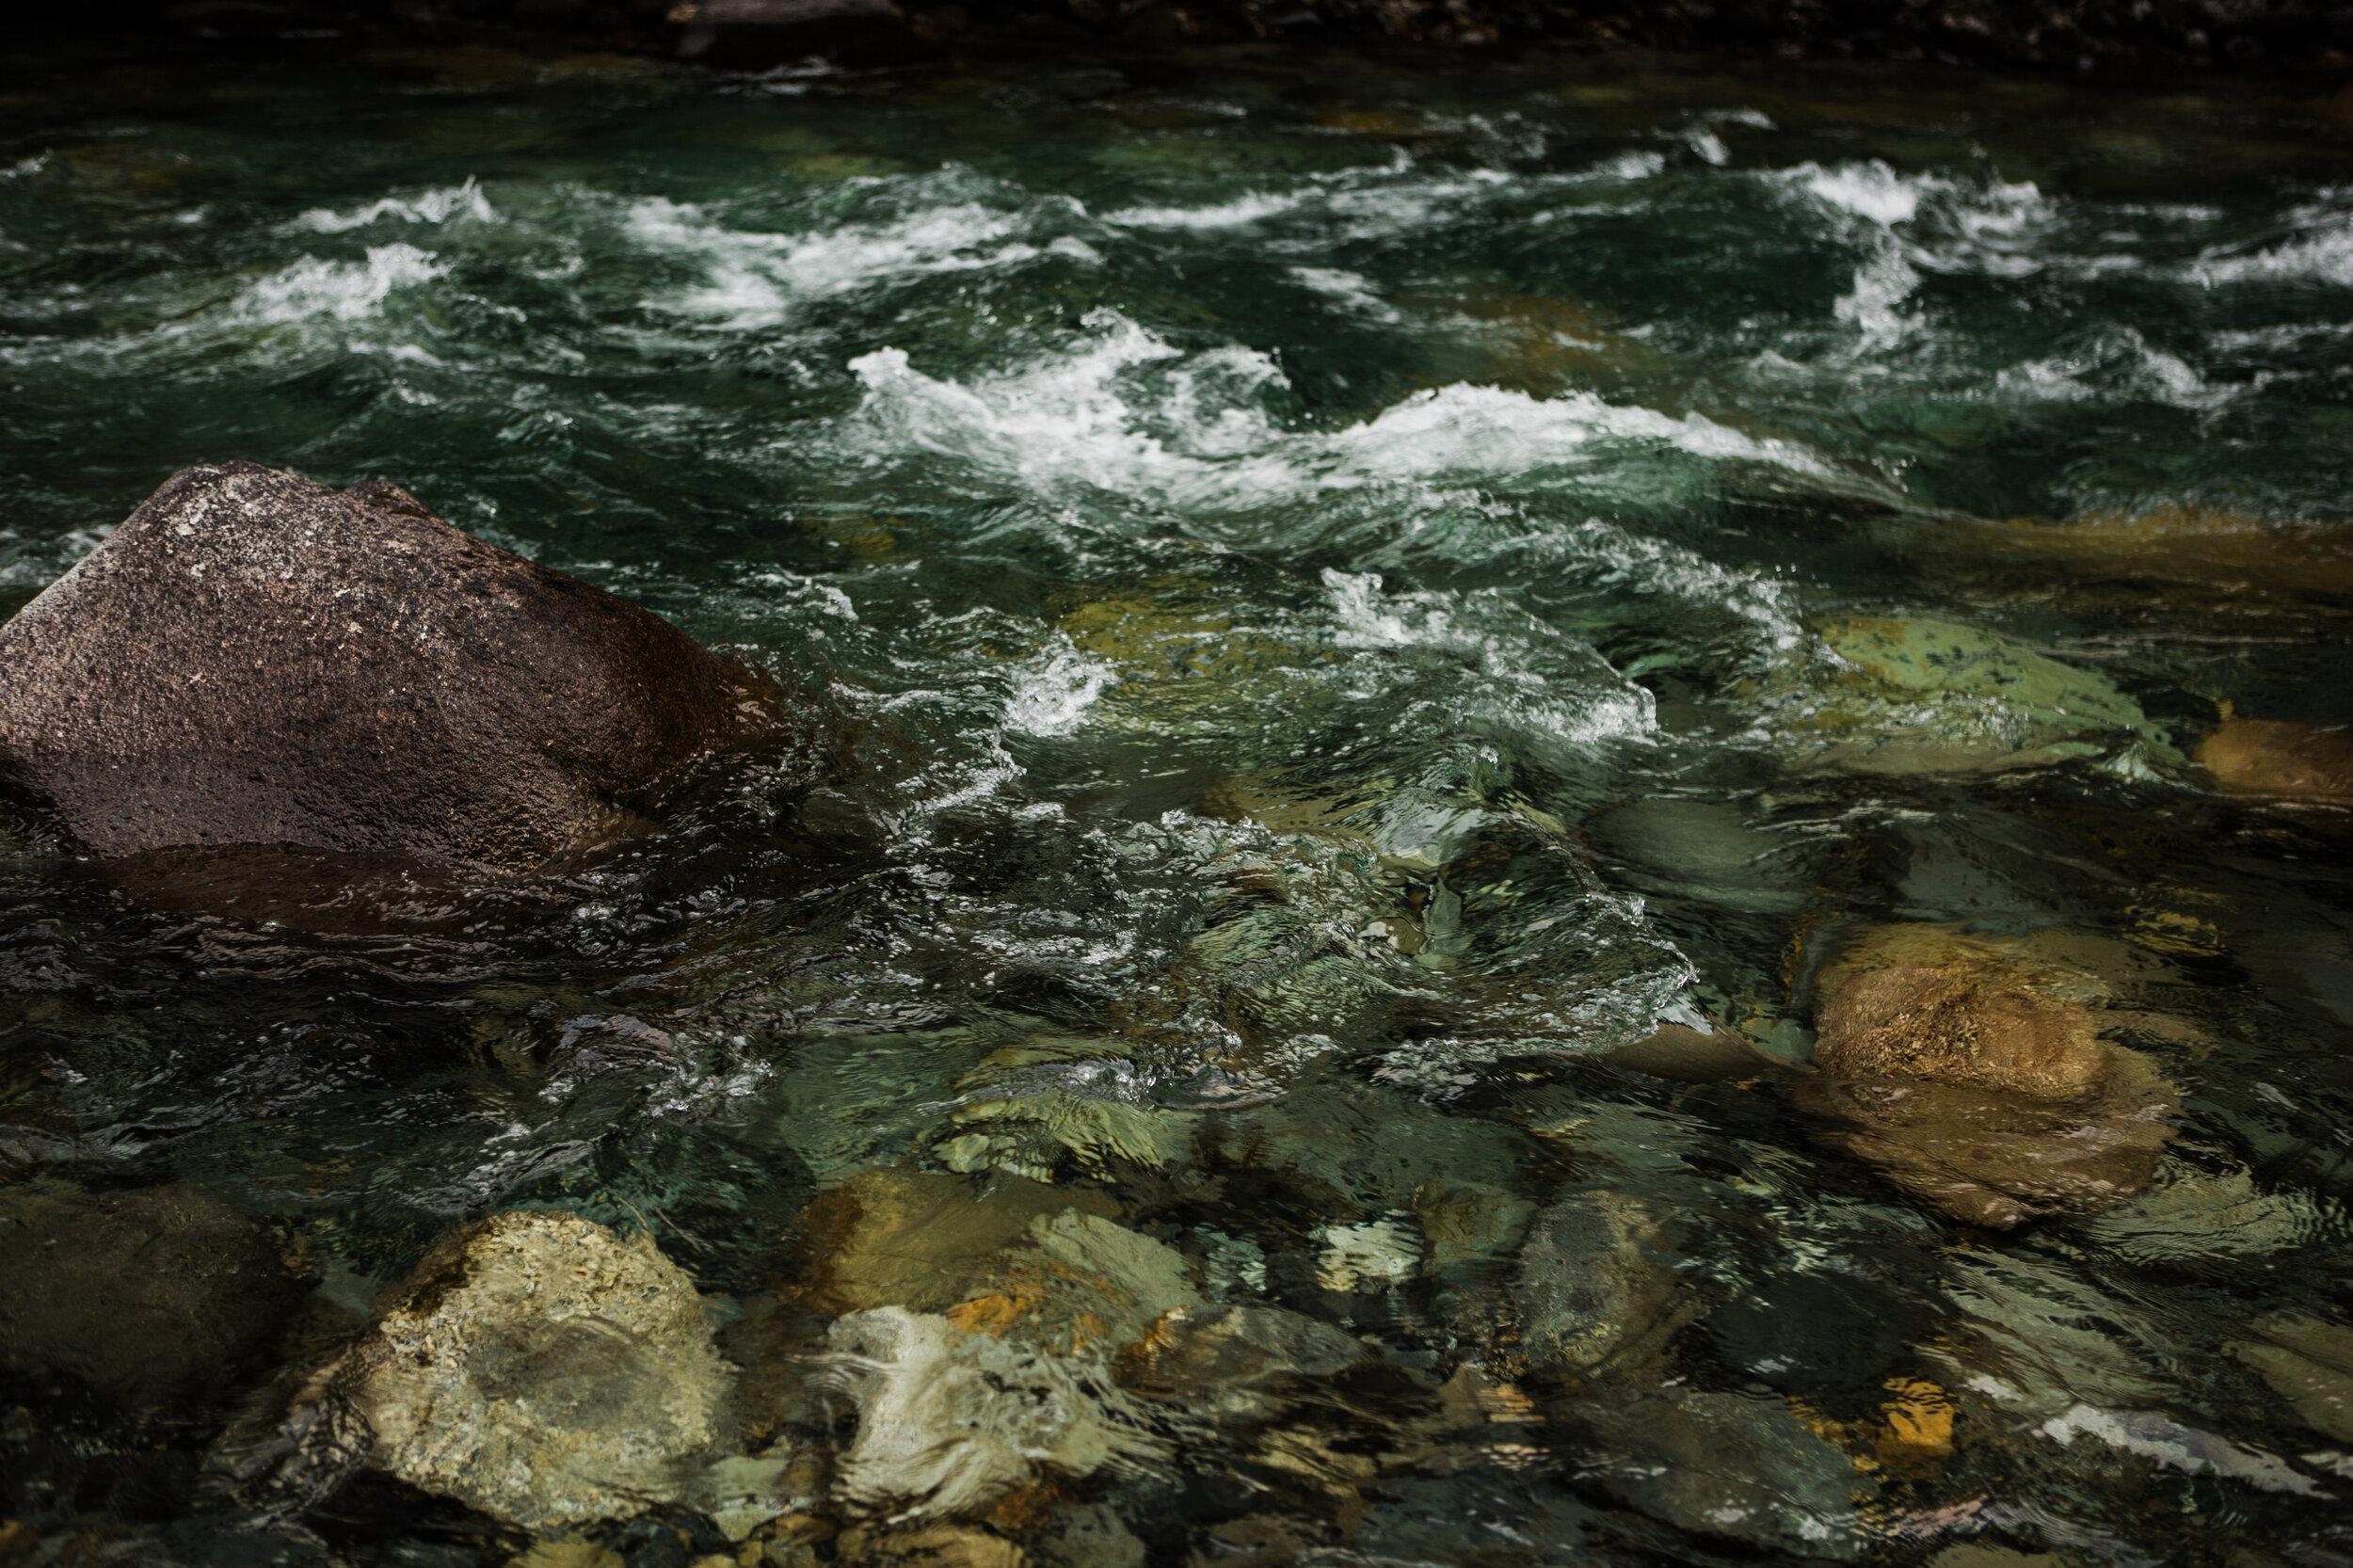 CindyGiovagnoli_North_Cascades_Washington_Nation_Park_camping_outdoors-016.jpg